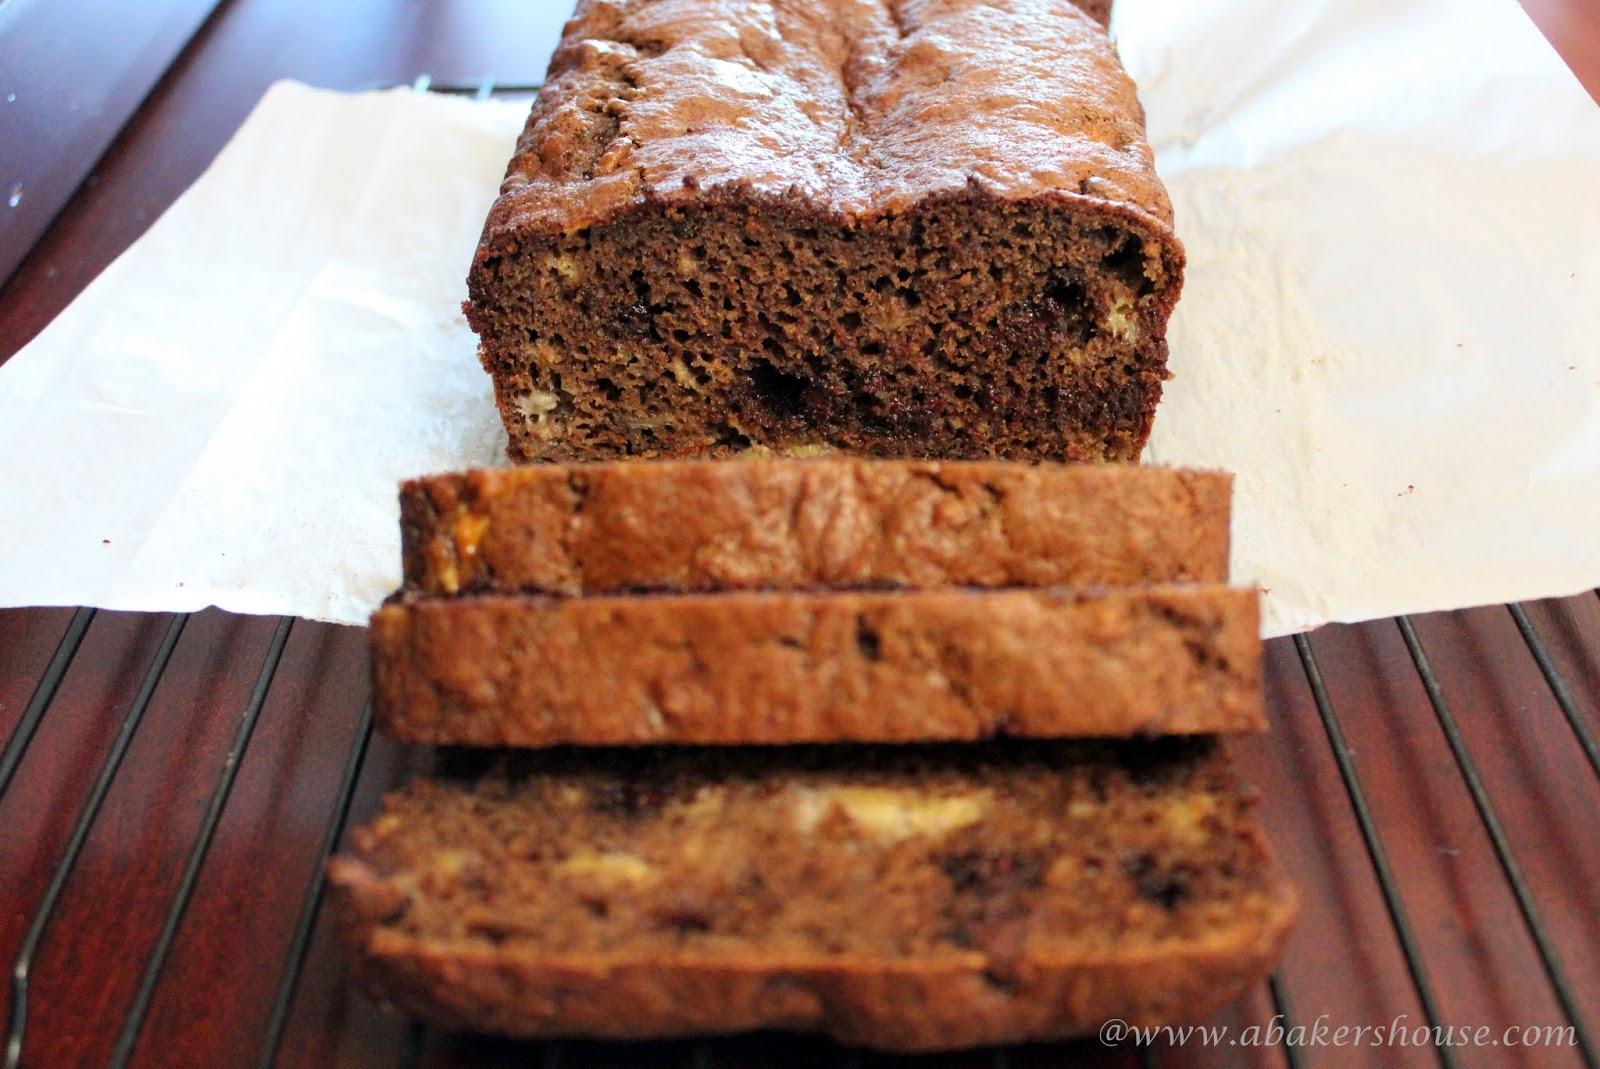 Chocolate-Chocolate Chip Banana Bread